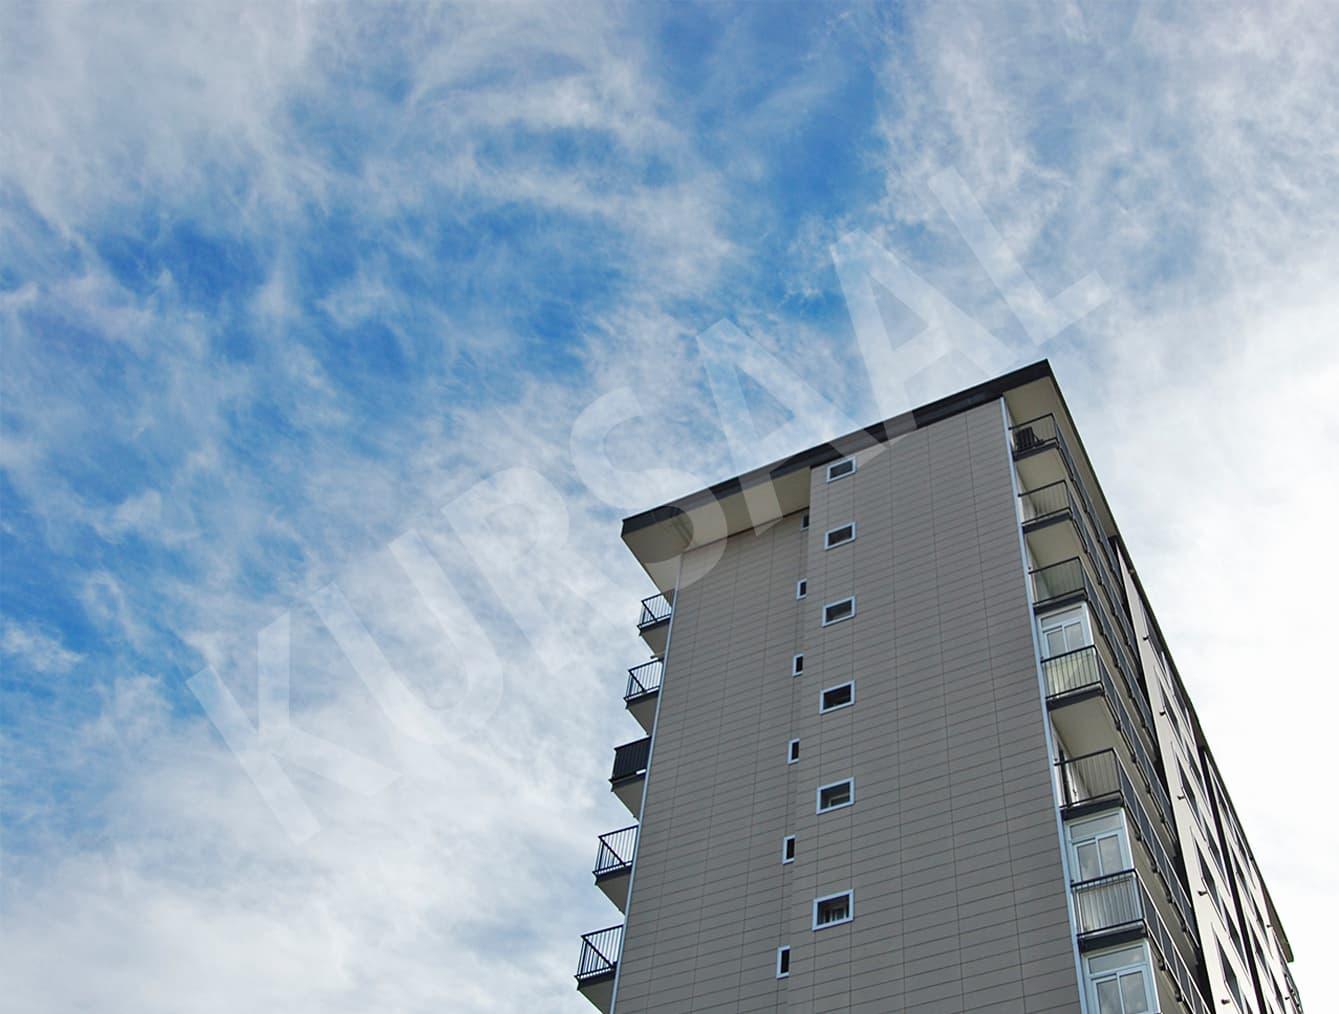 foto 13 - Aislamientos Térmicos y Eficiencia Energética-Arbesko Errota, 10-IRUN, GIPUZKOA